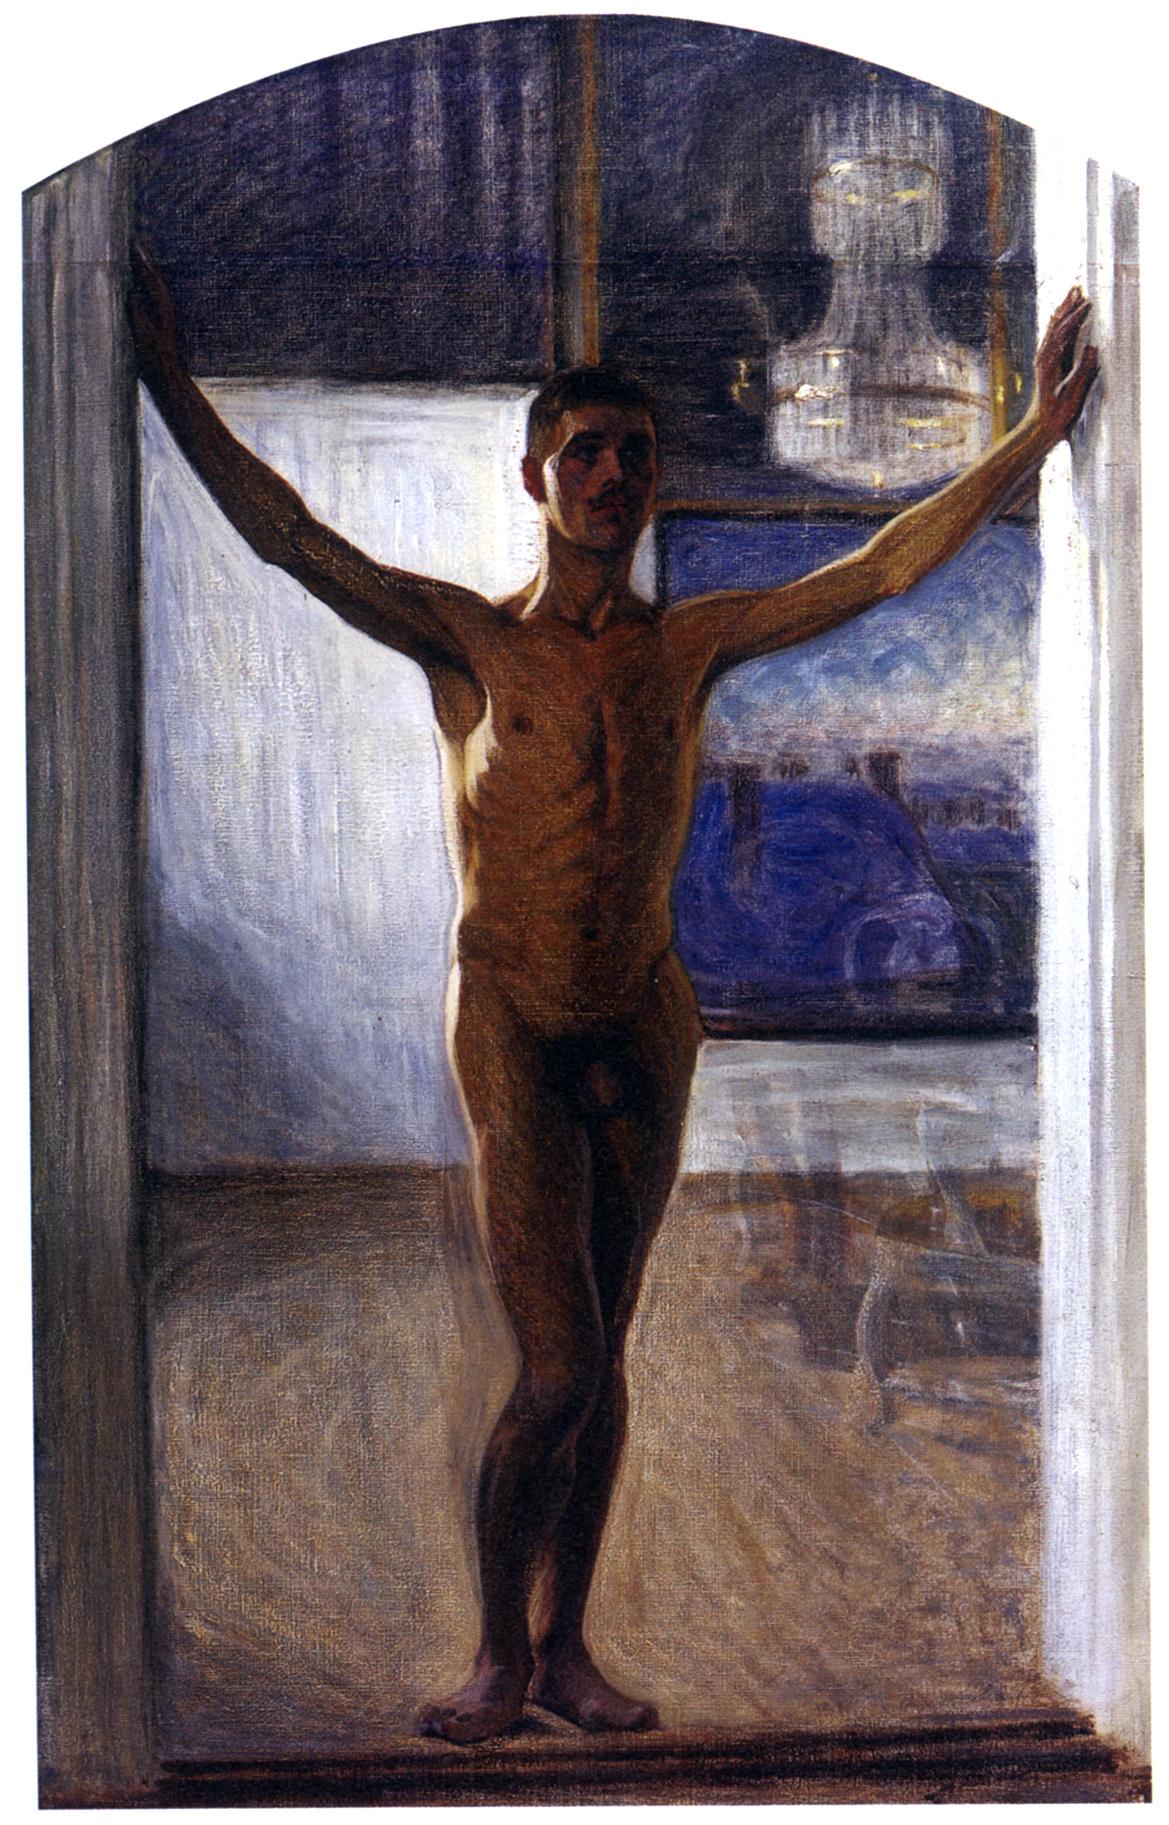 Eugéne_JANSSON_Nudo sulla soglia_(Knut Nyman )1906_(Prins Eugens Waldemarsudde_Stoccolma)